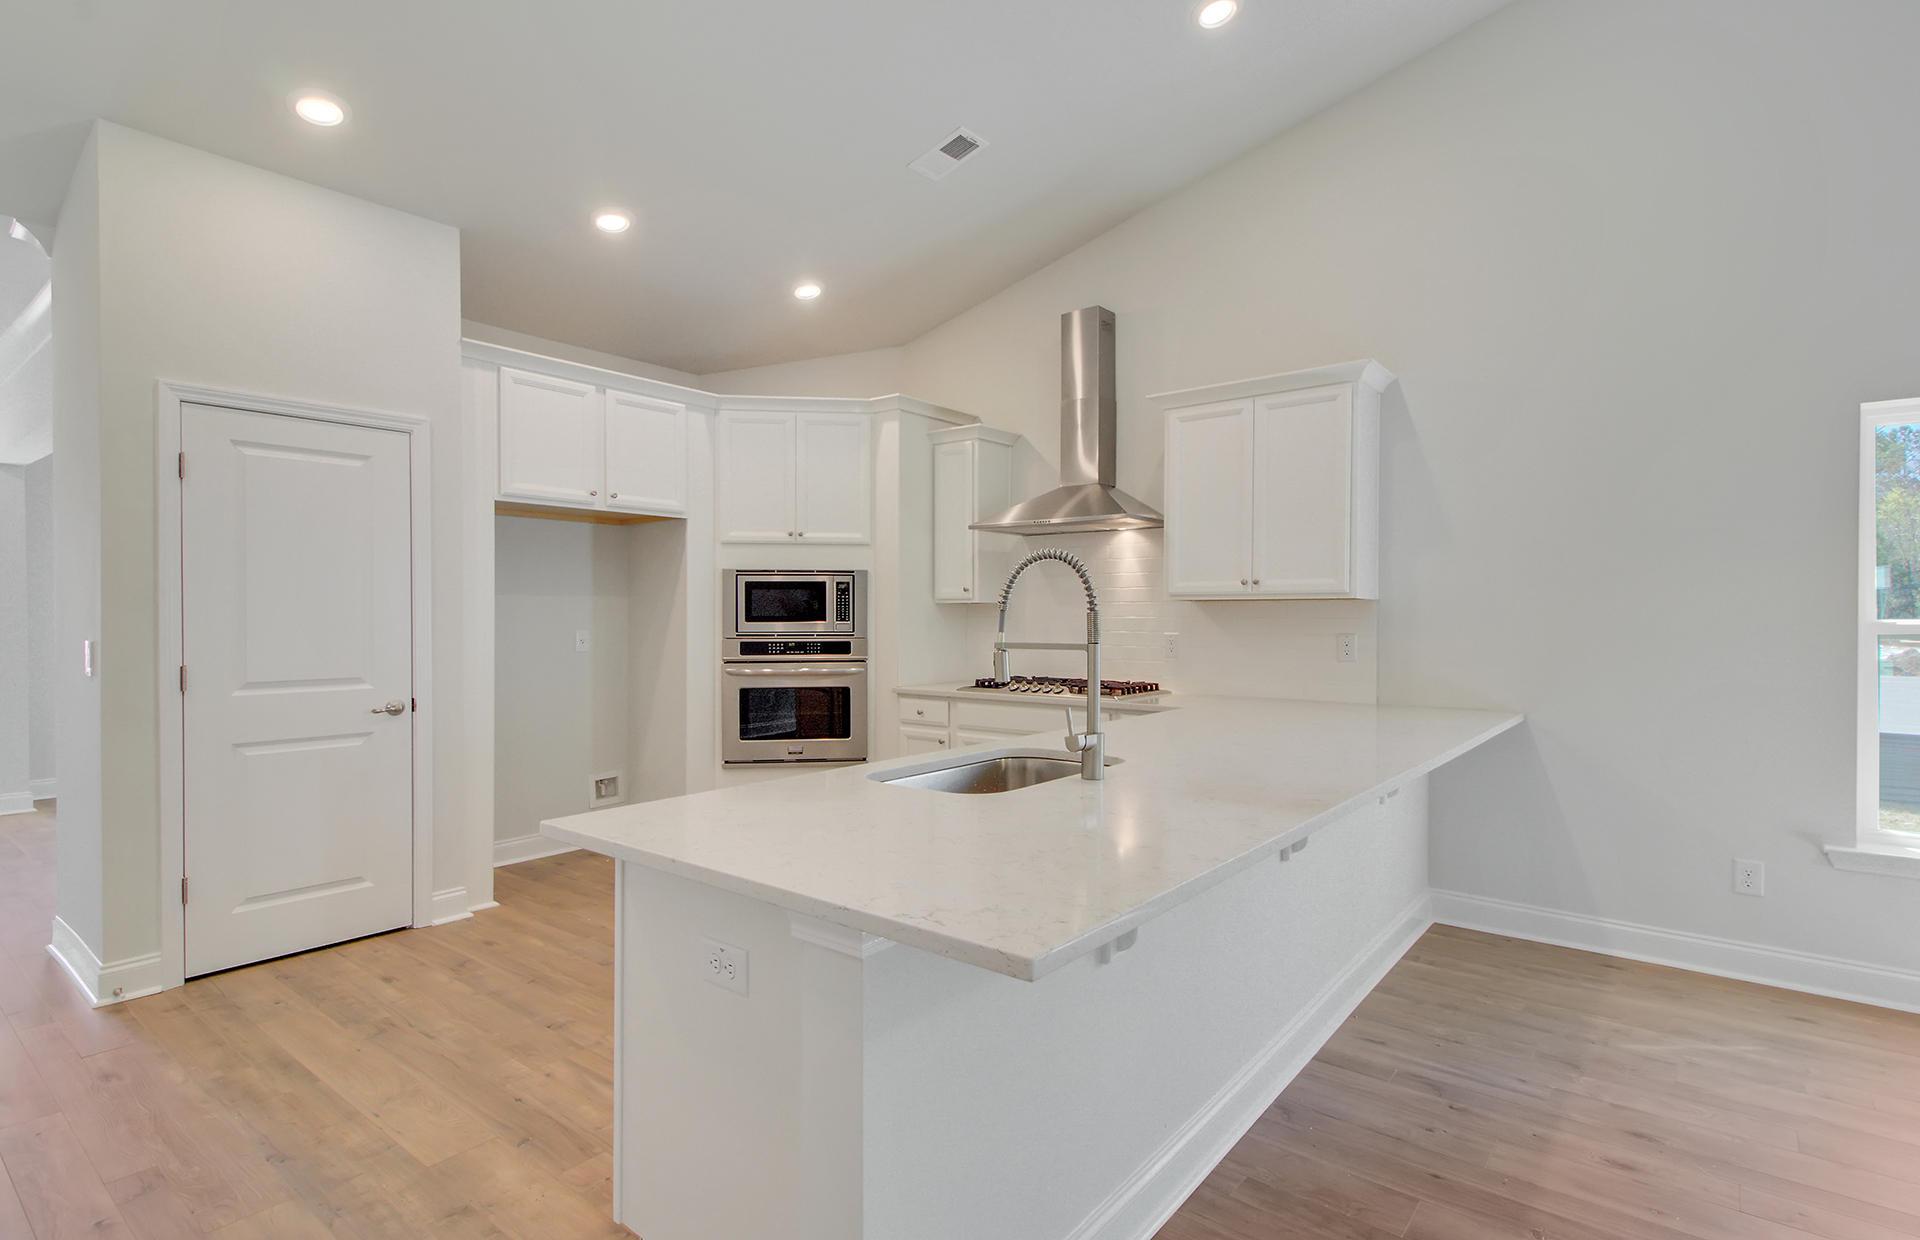 Park West Homes For Sale - 3062 Rice Field, Mount Pleasant, SC - 22